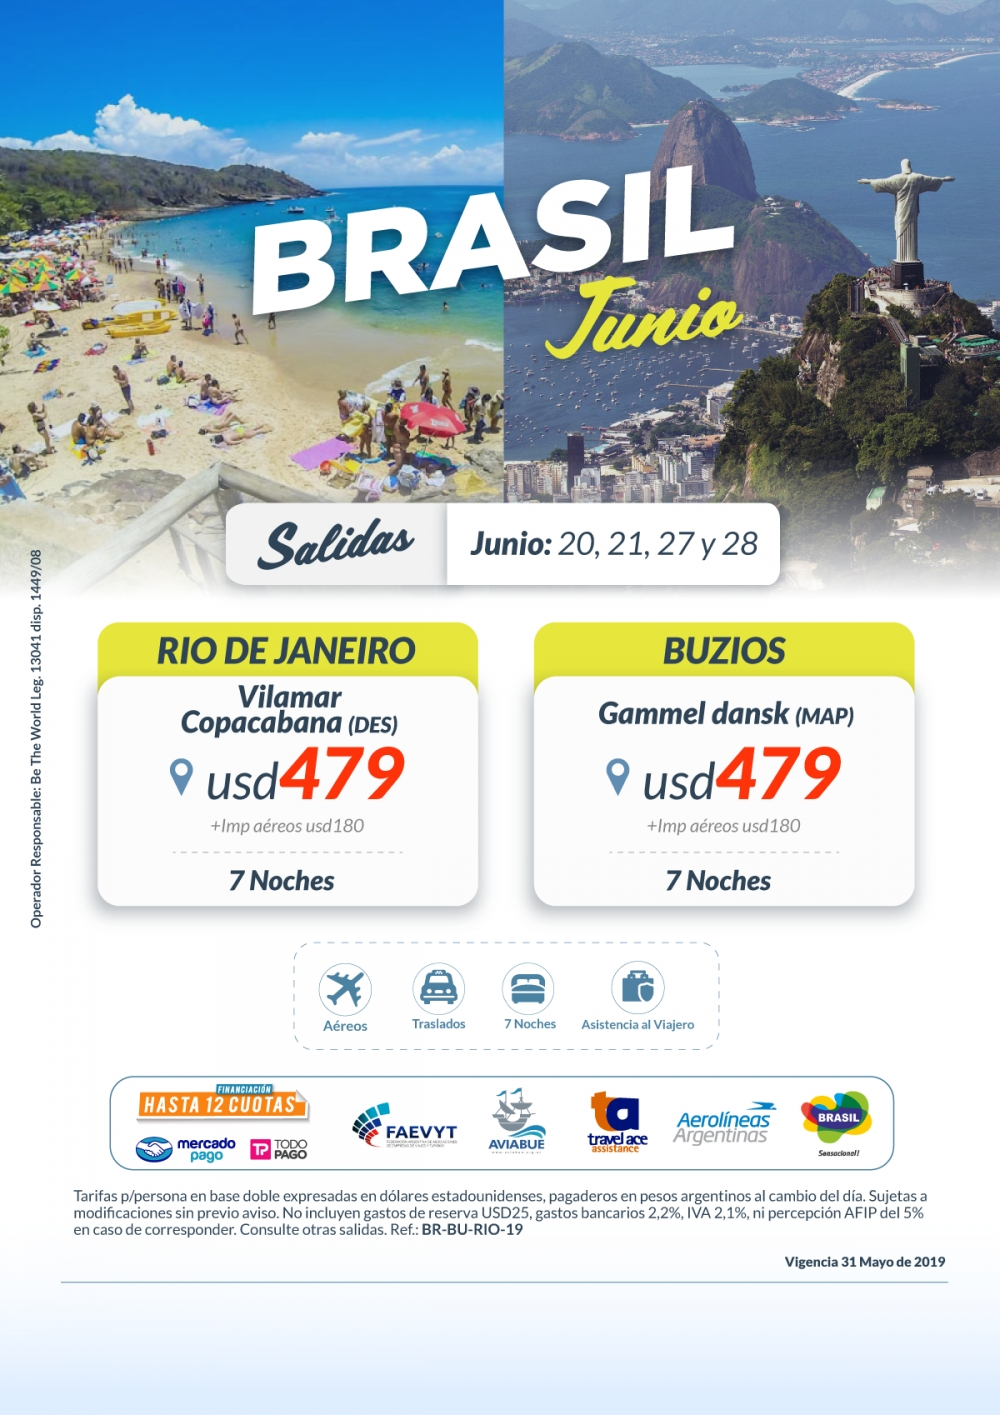 BRASIL - Buzios - Rio de Janeiro - Salidas Junio